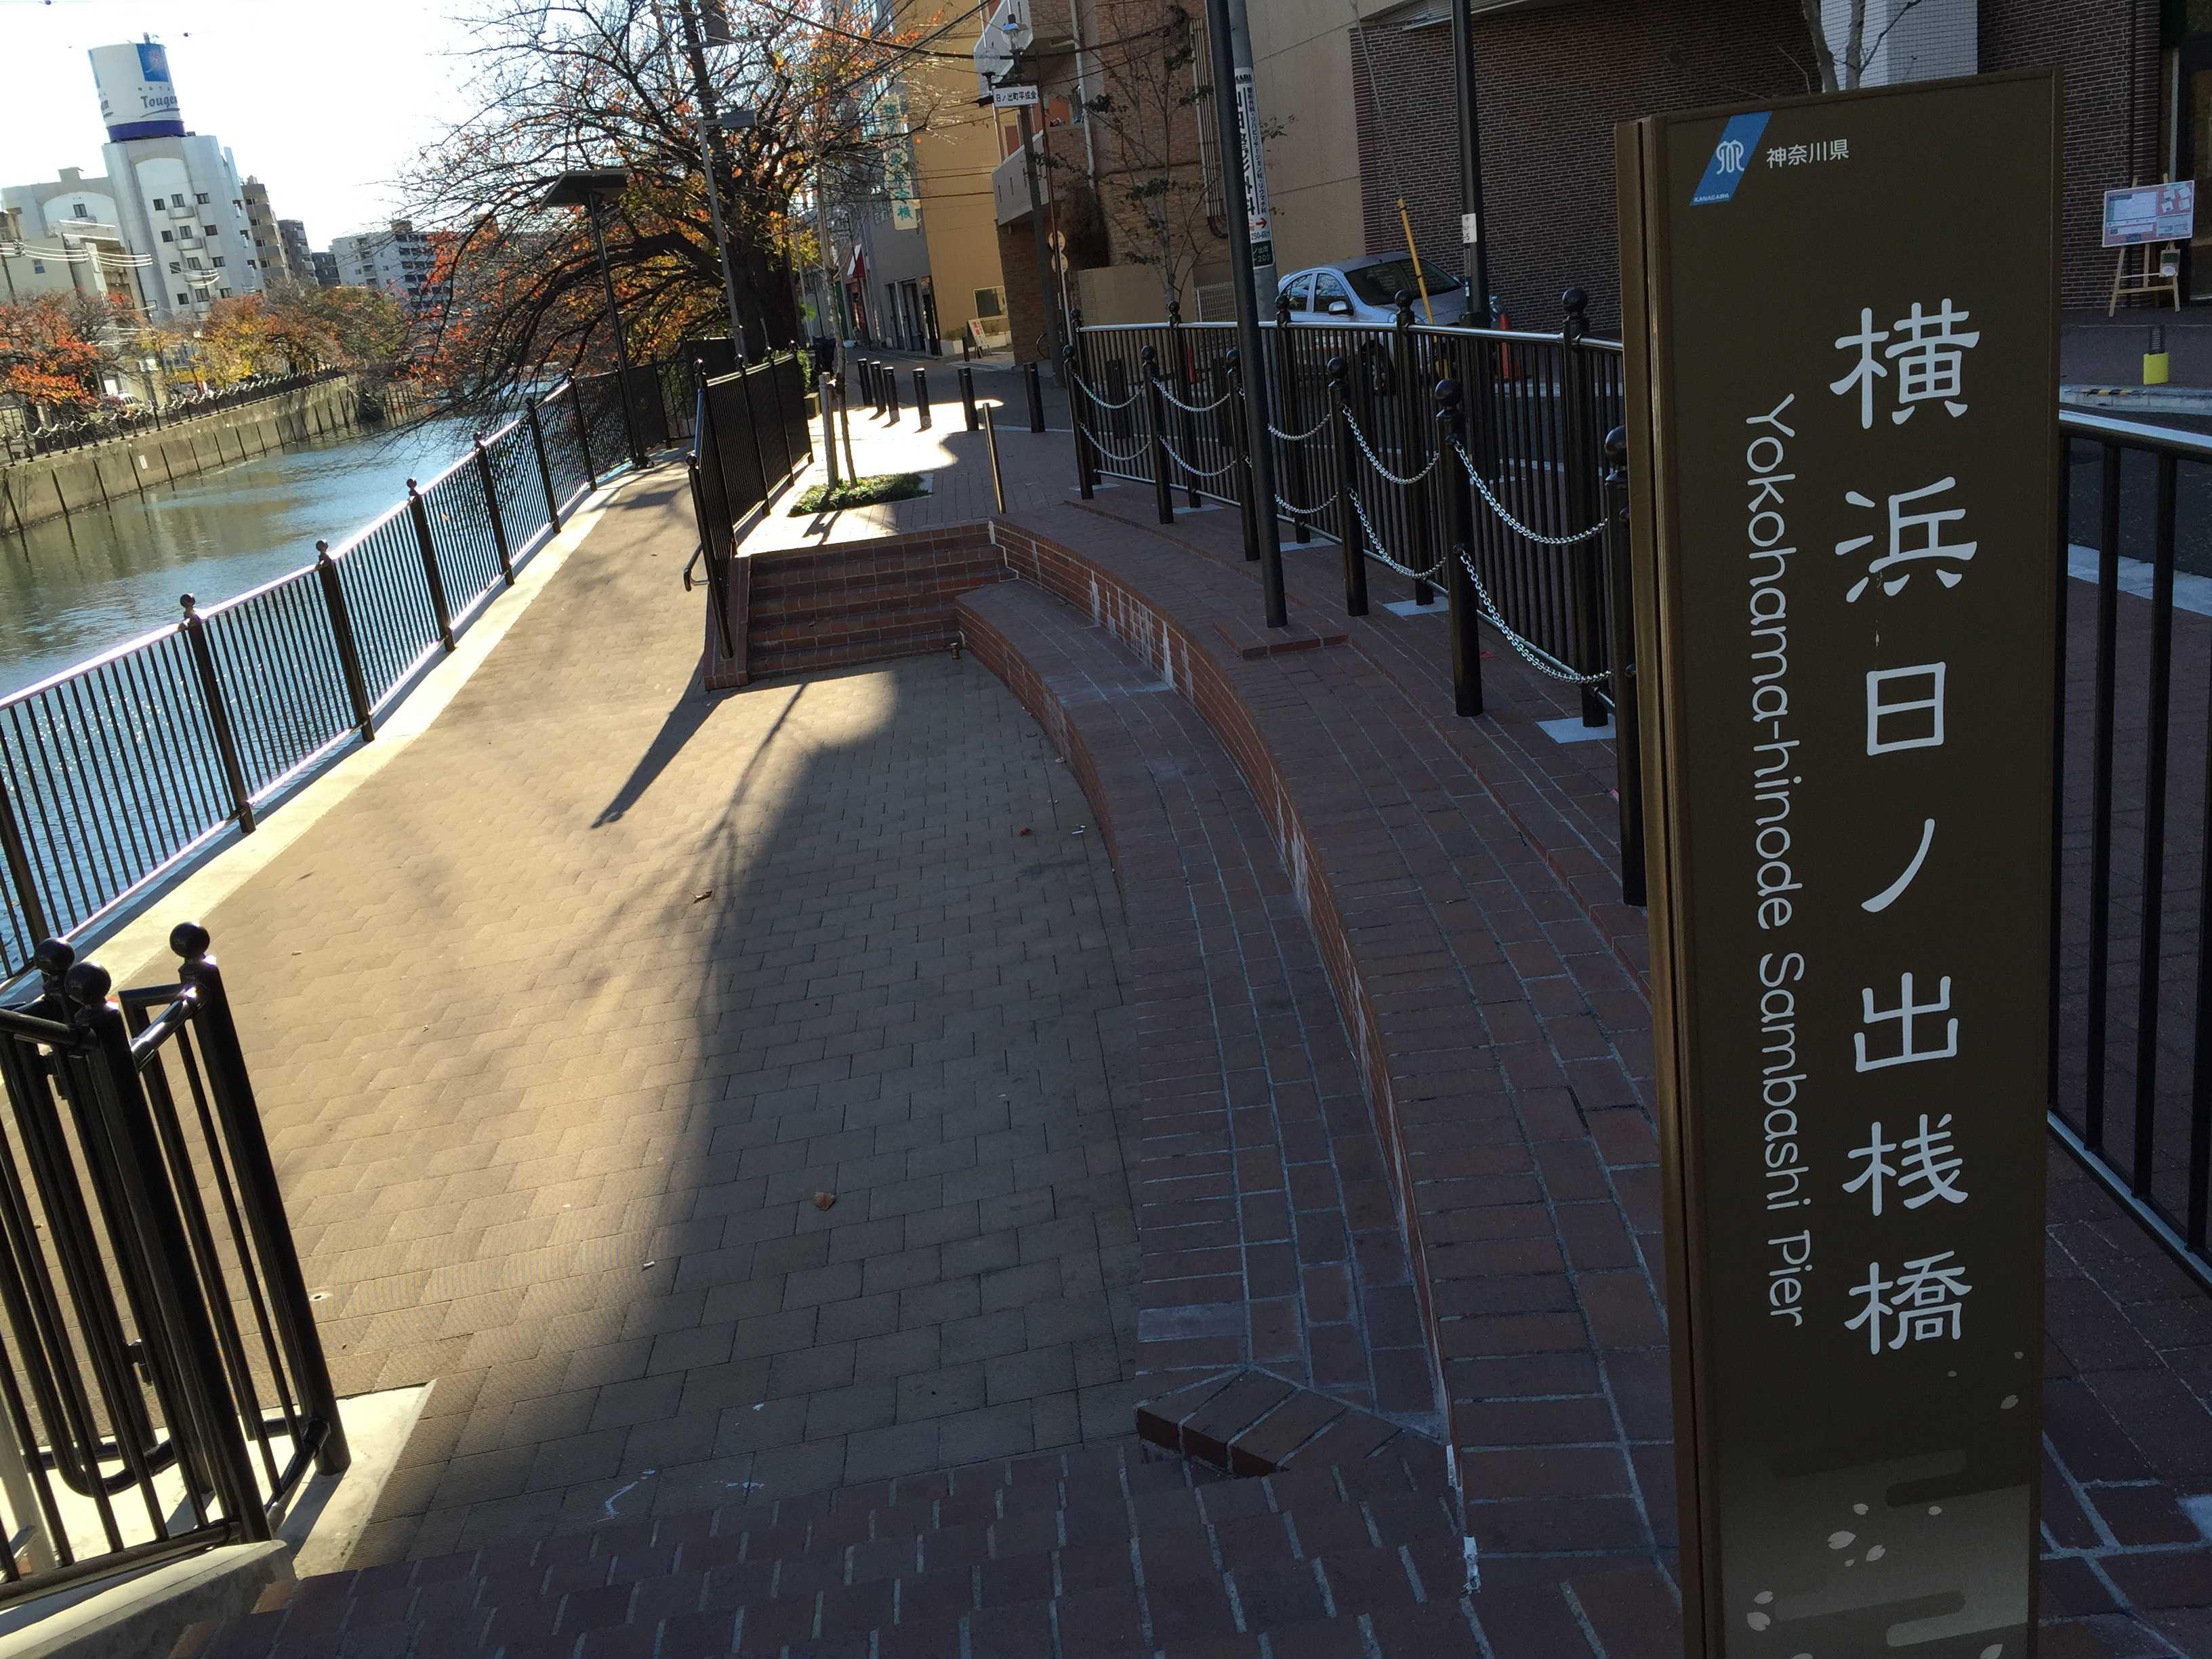 横浜日ノ出桟橋